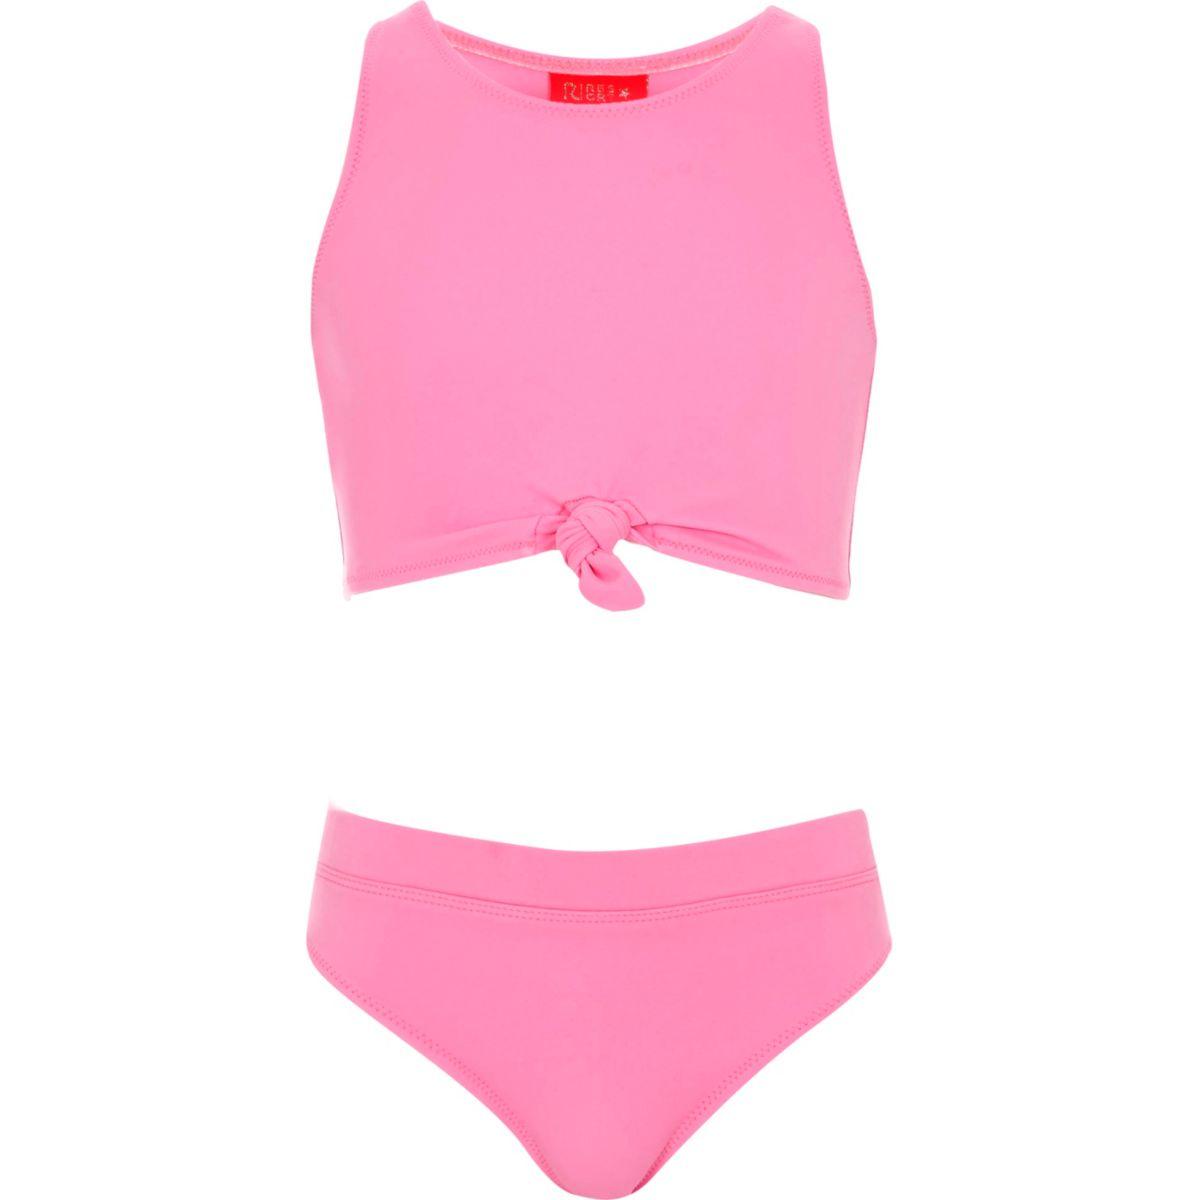 Girls pink knot crop top bikini set